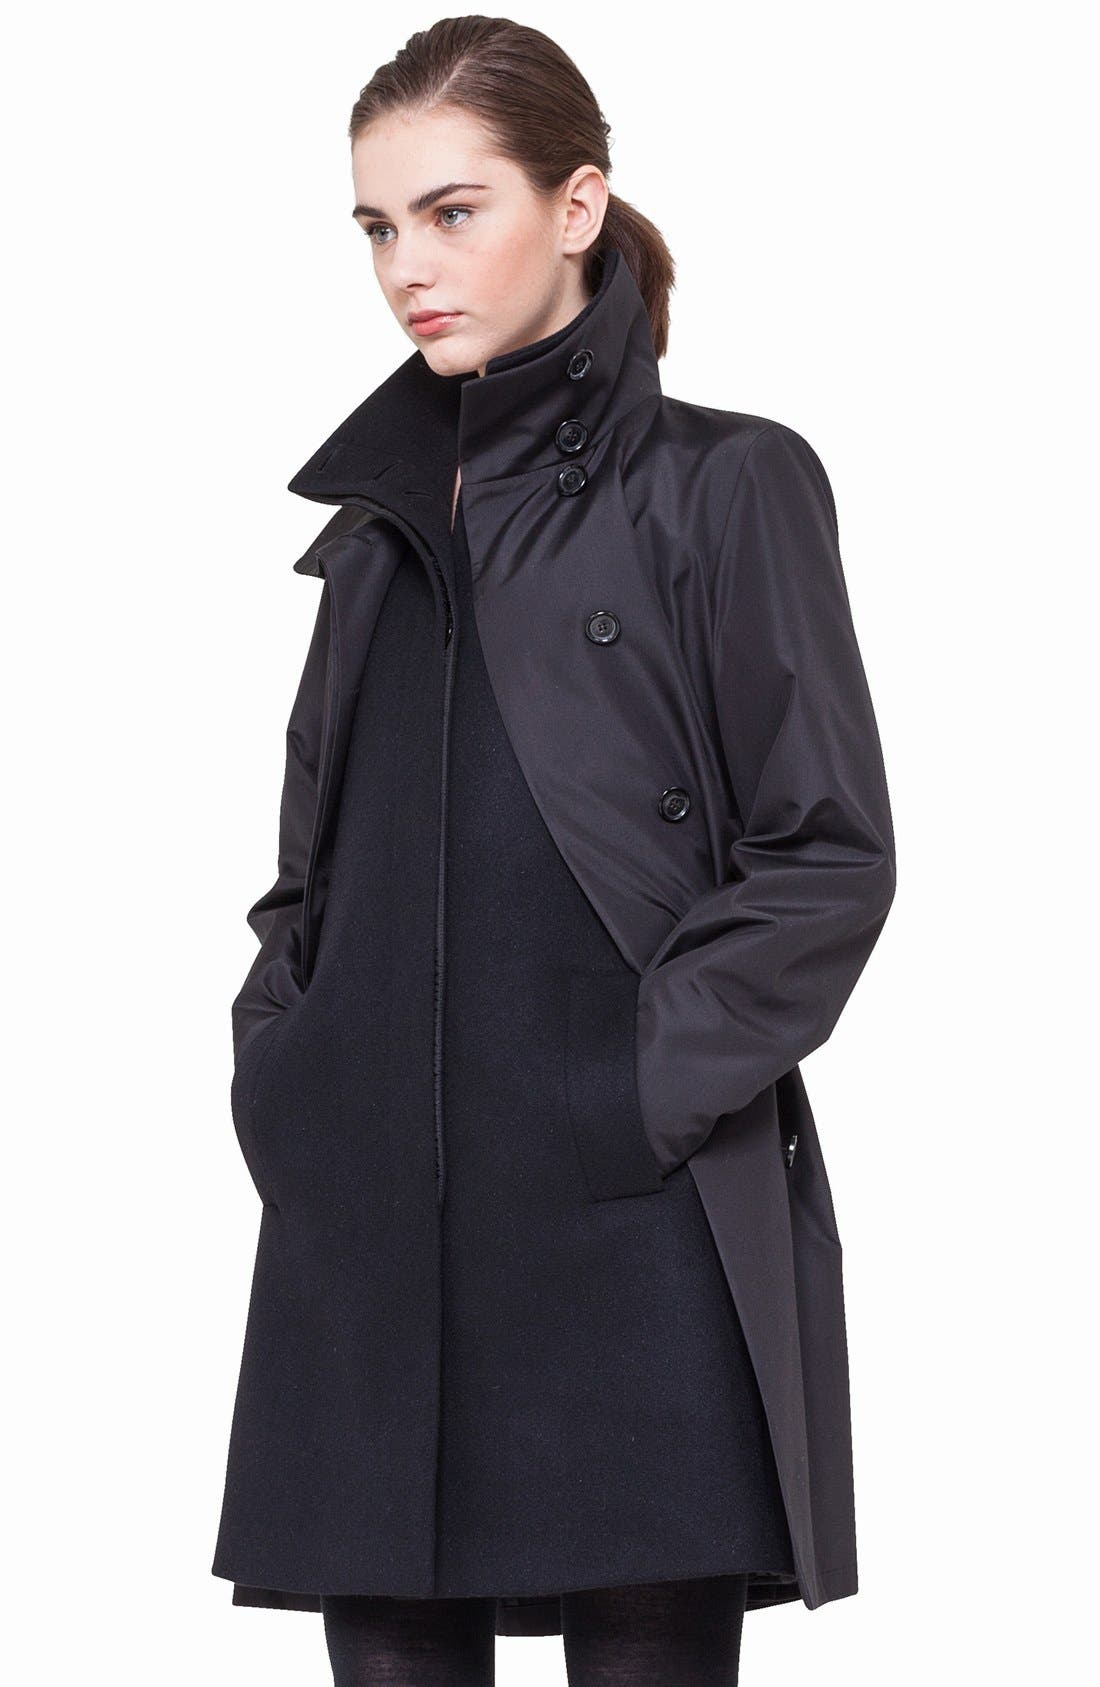 3-in-1 Technical Coat, Main, color, BLACK